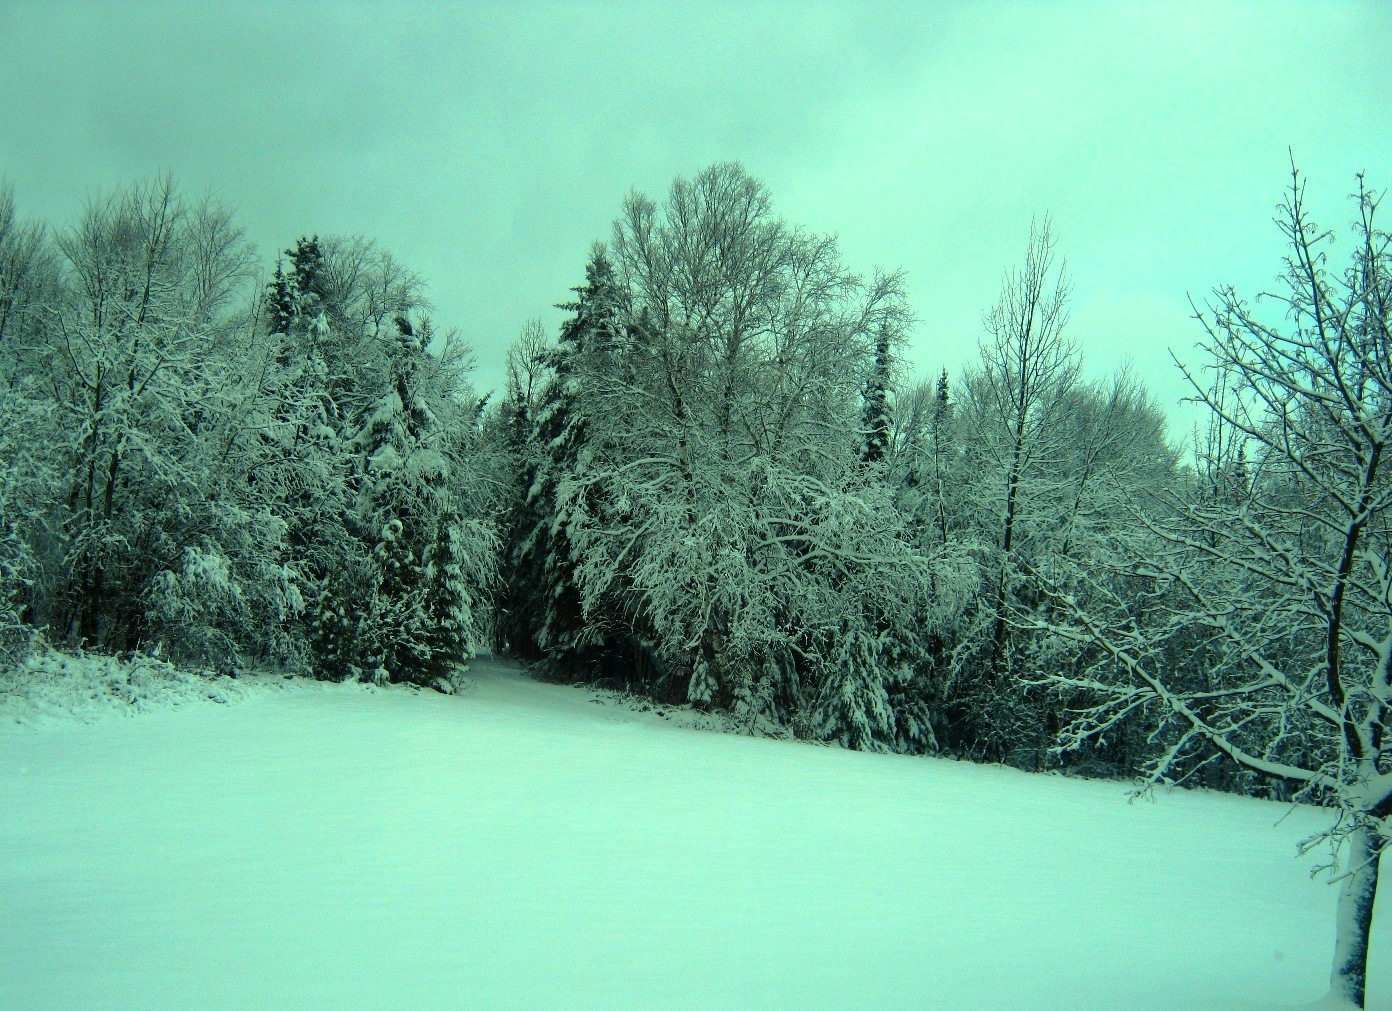 Snow, Snow Go Away by sllennips